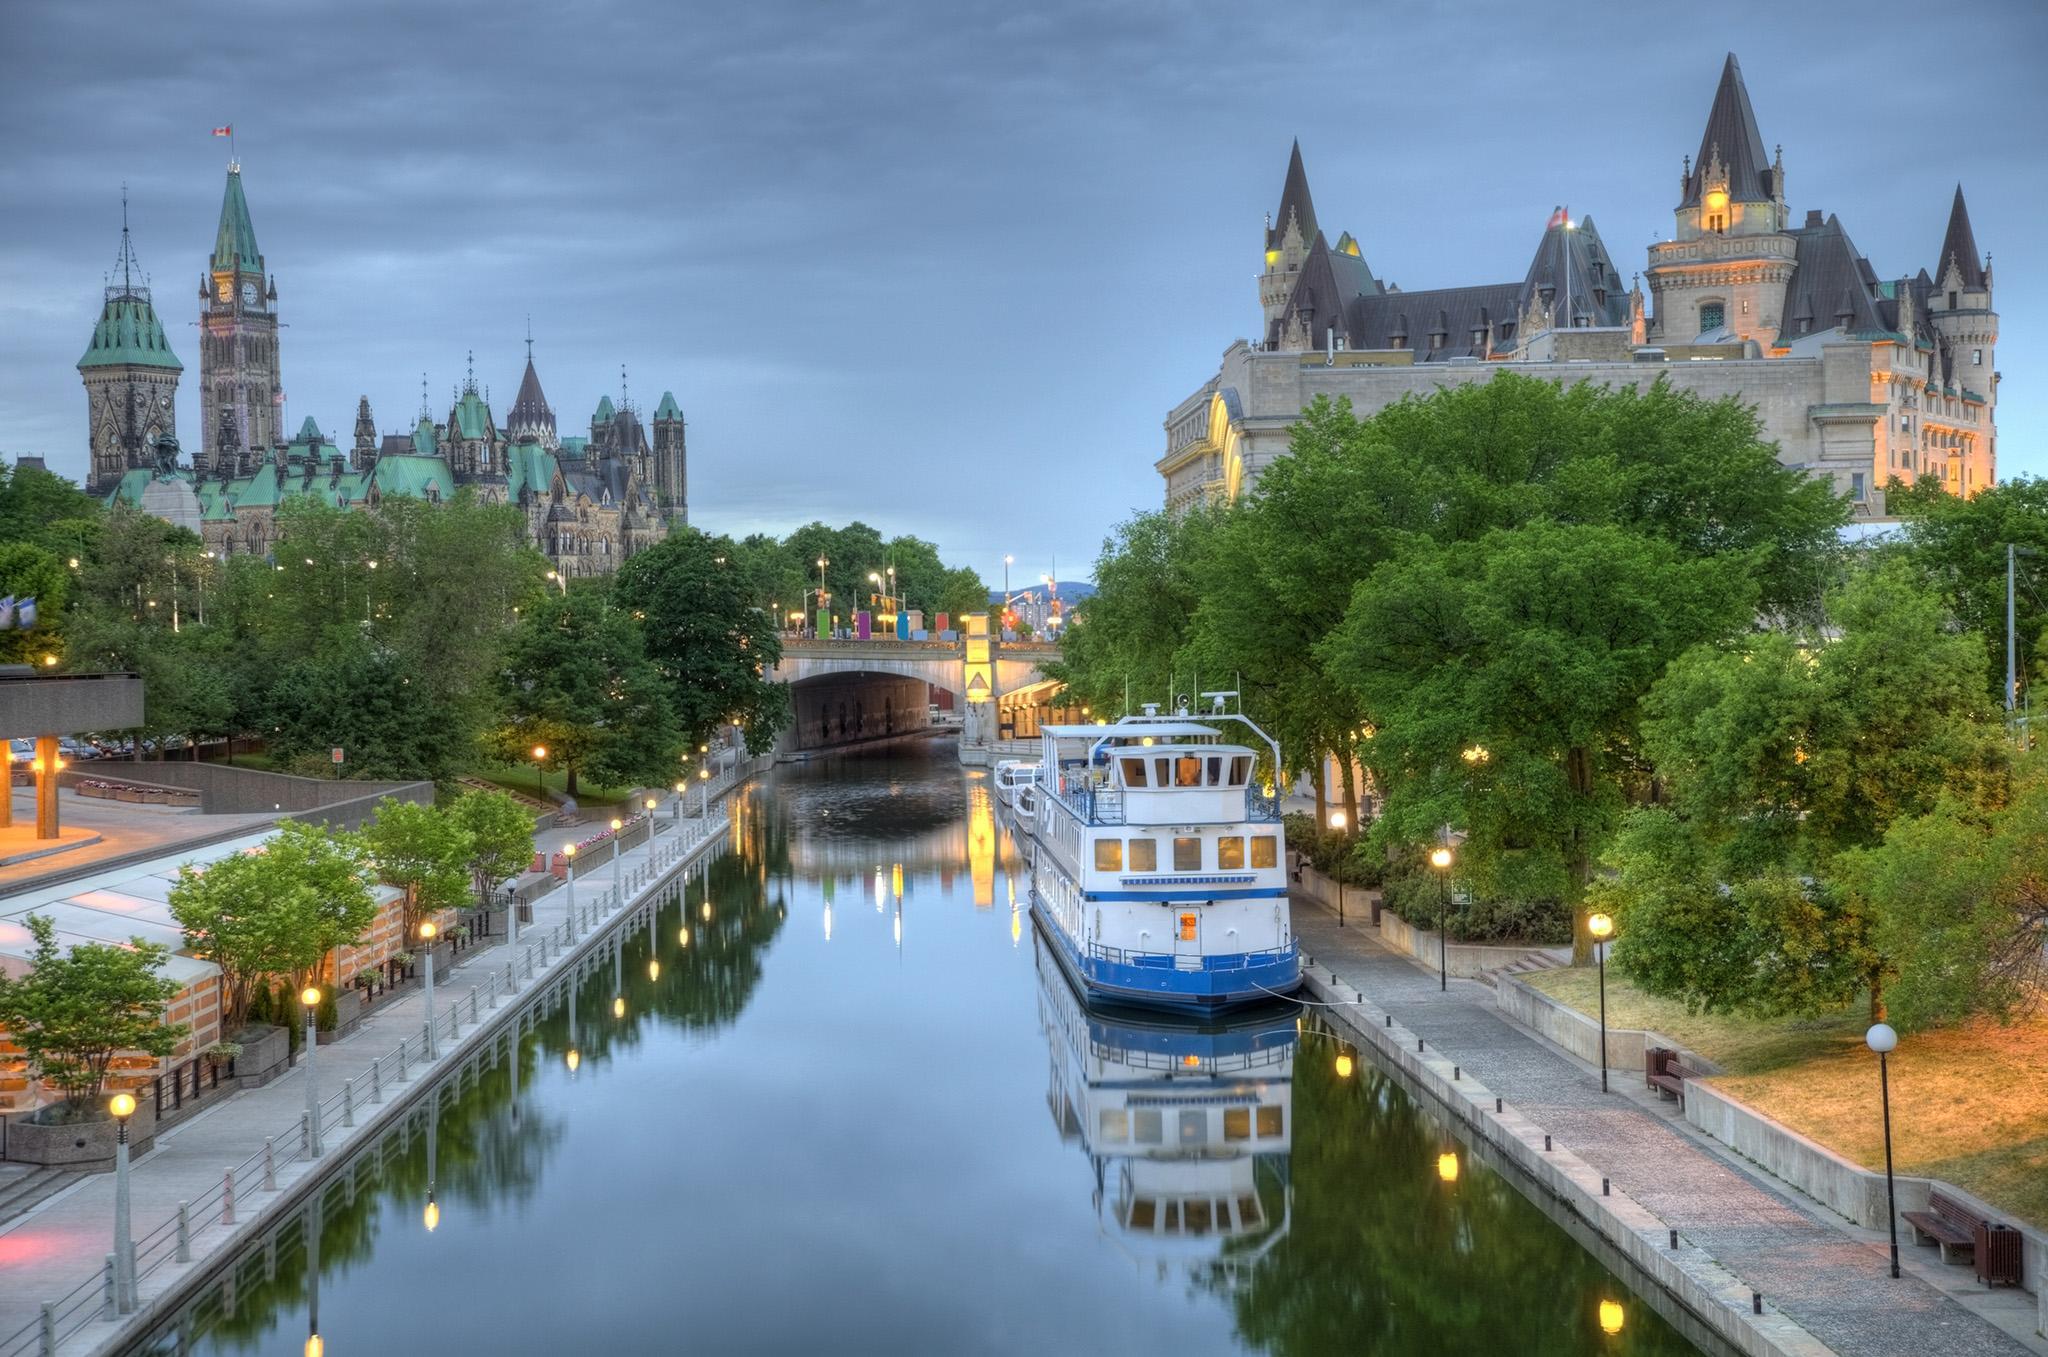 20. Ottawa, Canada